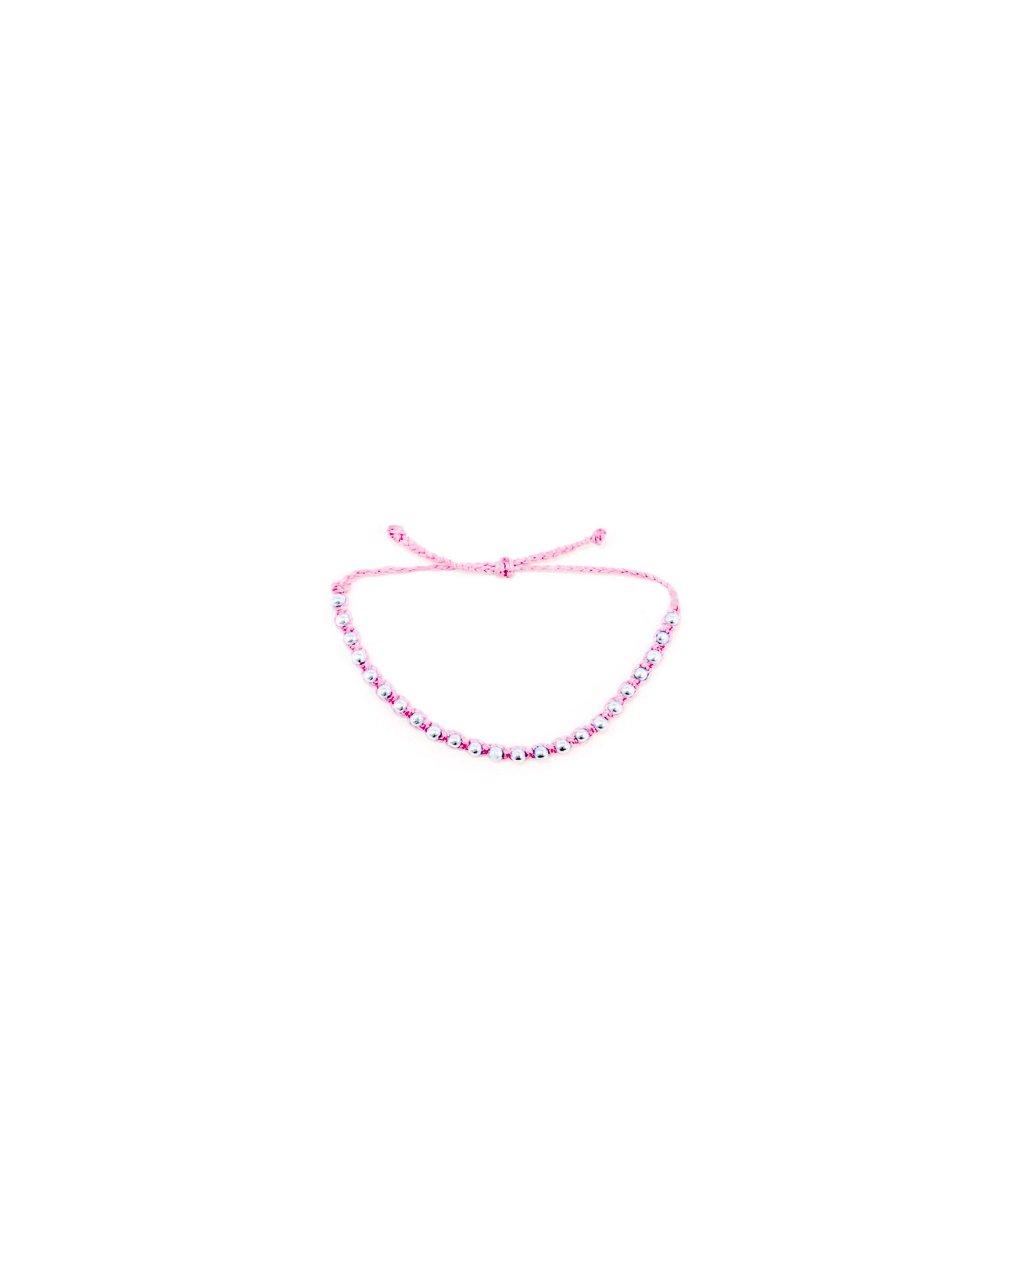 Jemný provázkový náramek macramé růžový